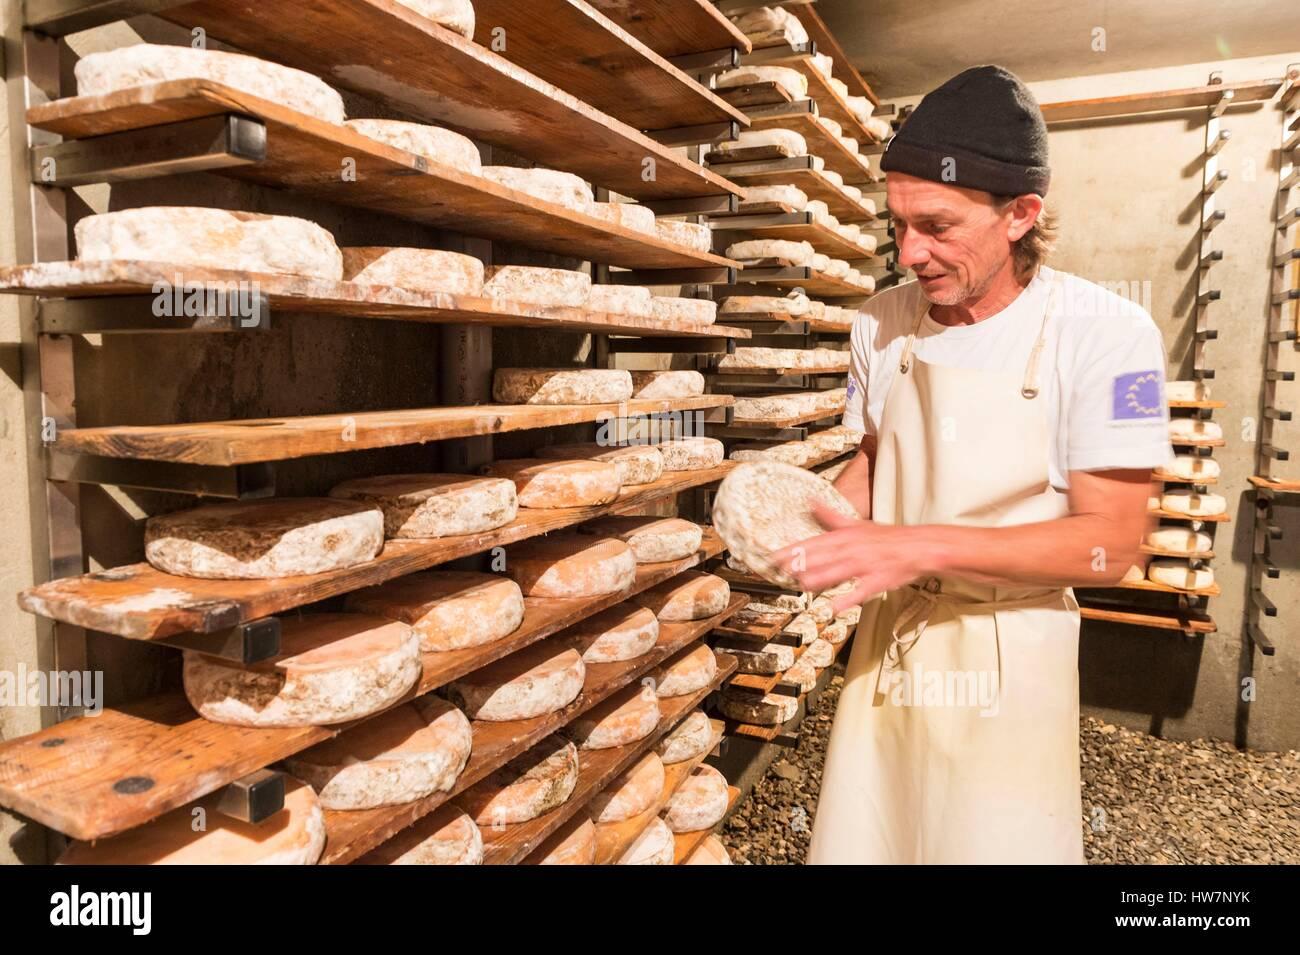 France, Haute Savoie, Morzine, Alpage Ecole Seraussaix, cheese in the cellar of Abondance AOP - Stock Image